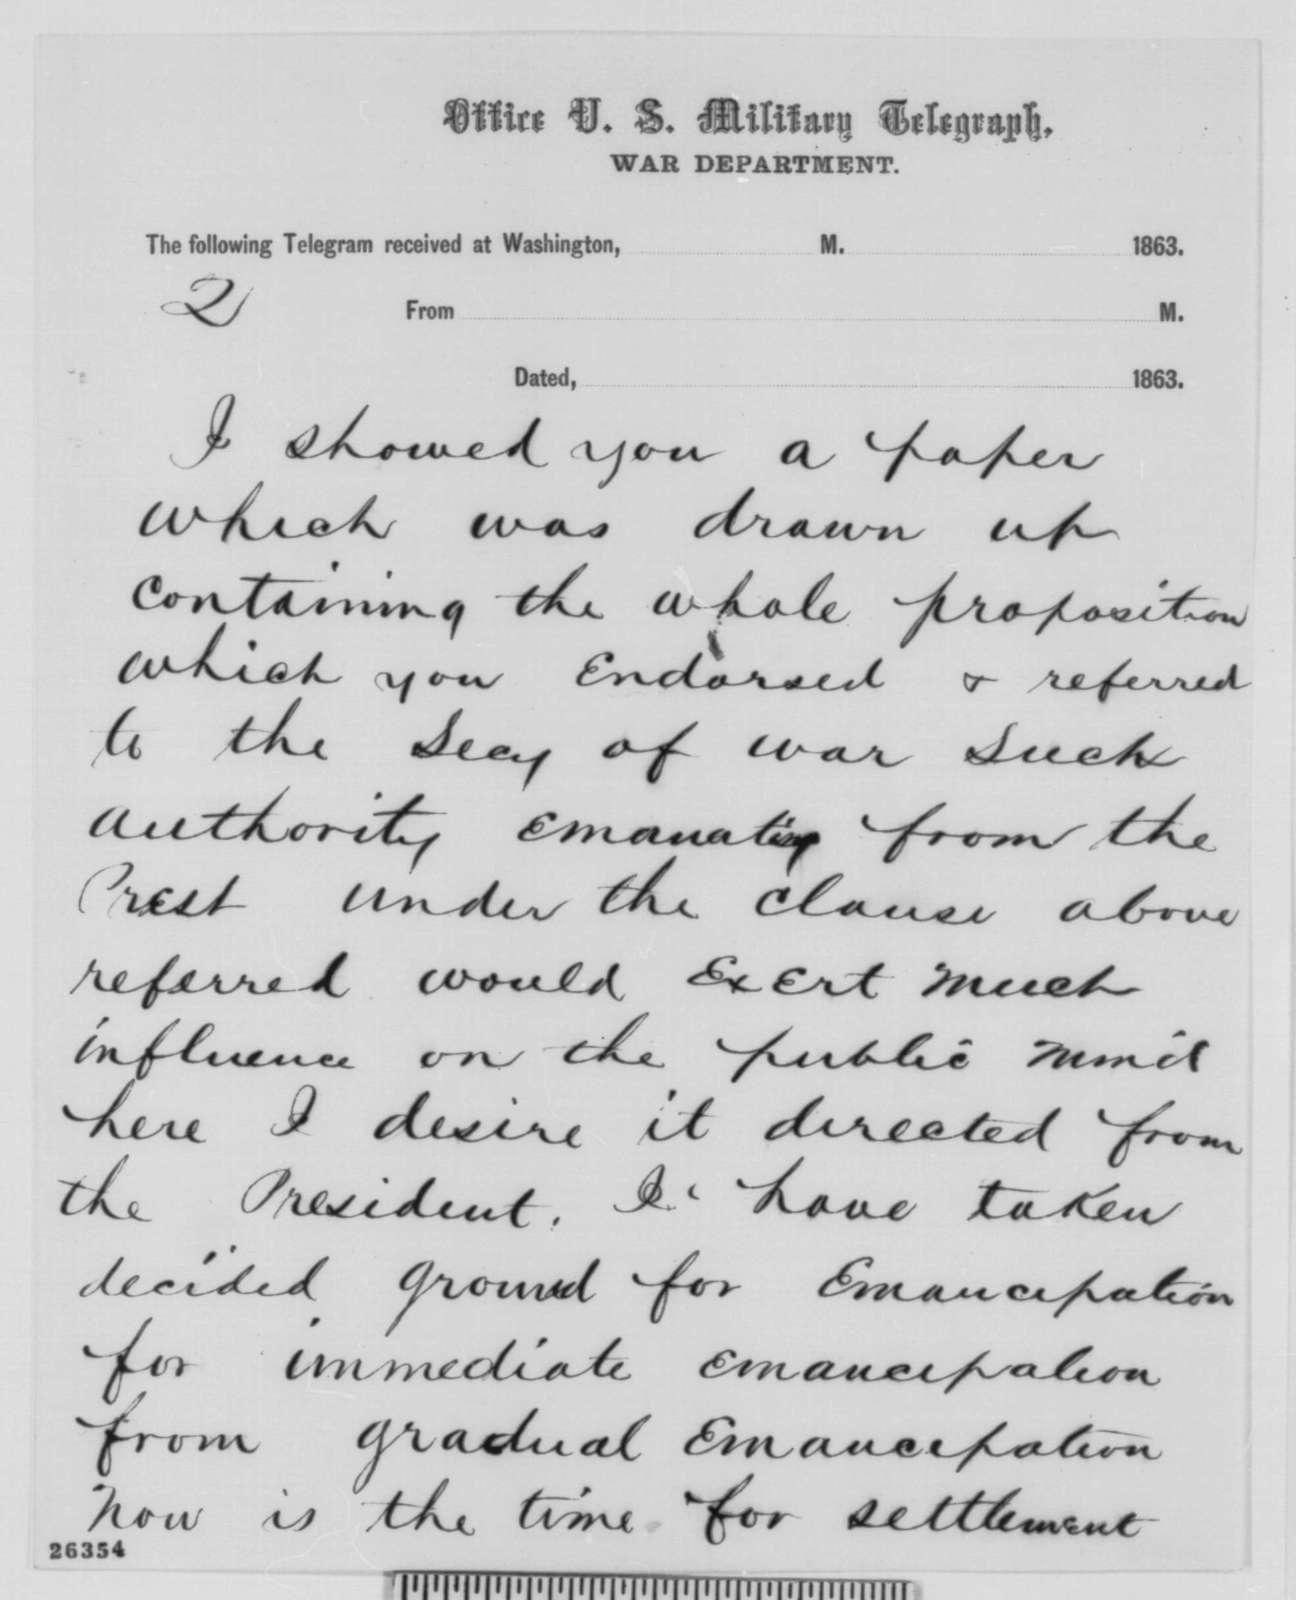 Andrew Johnson to Abraham Lincoln, Thursday, September 17, 1863  (Telegram in reply to Lincoln's letter of September 11 regarding affairs in Tennessee)